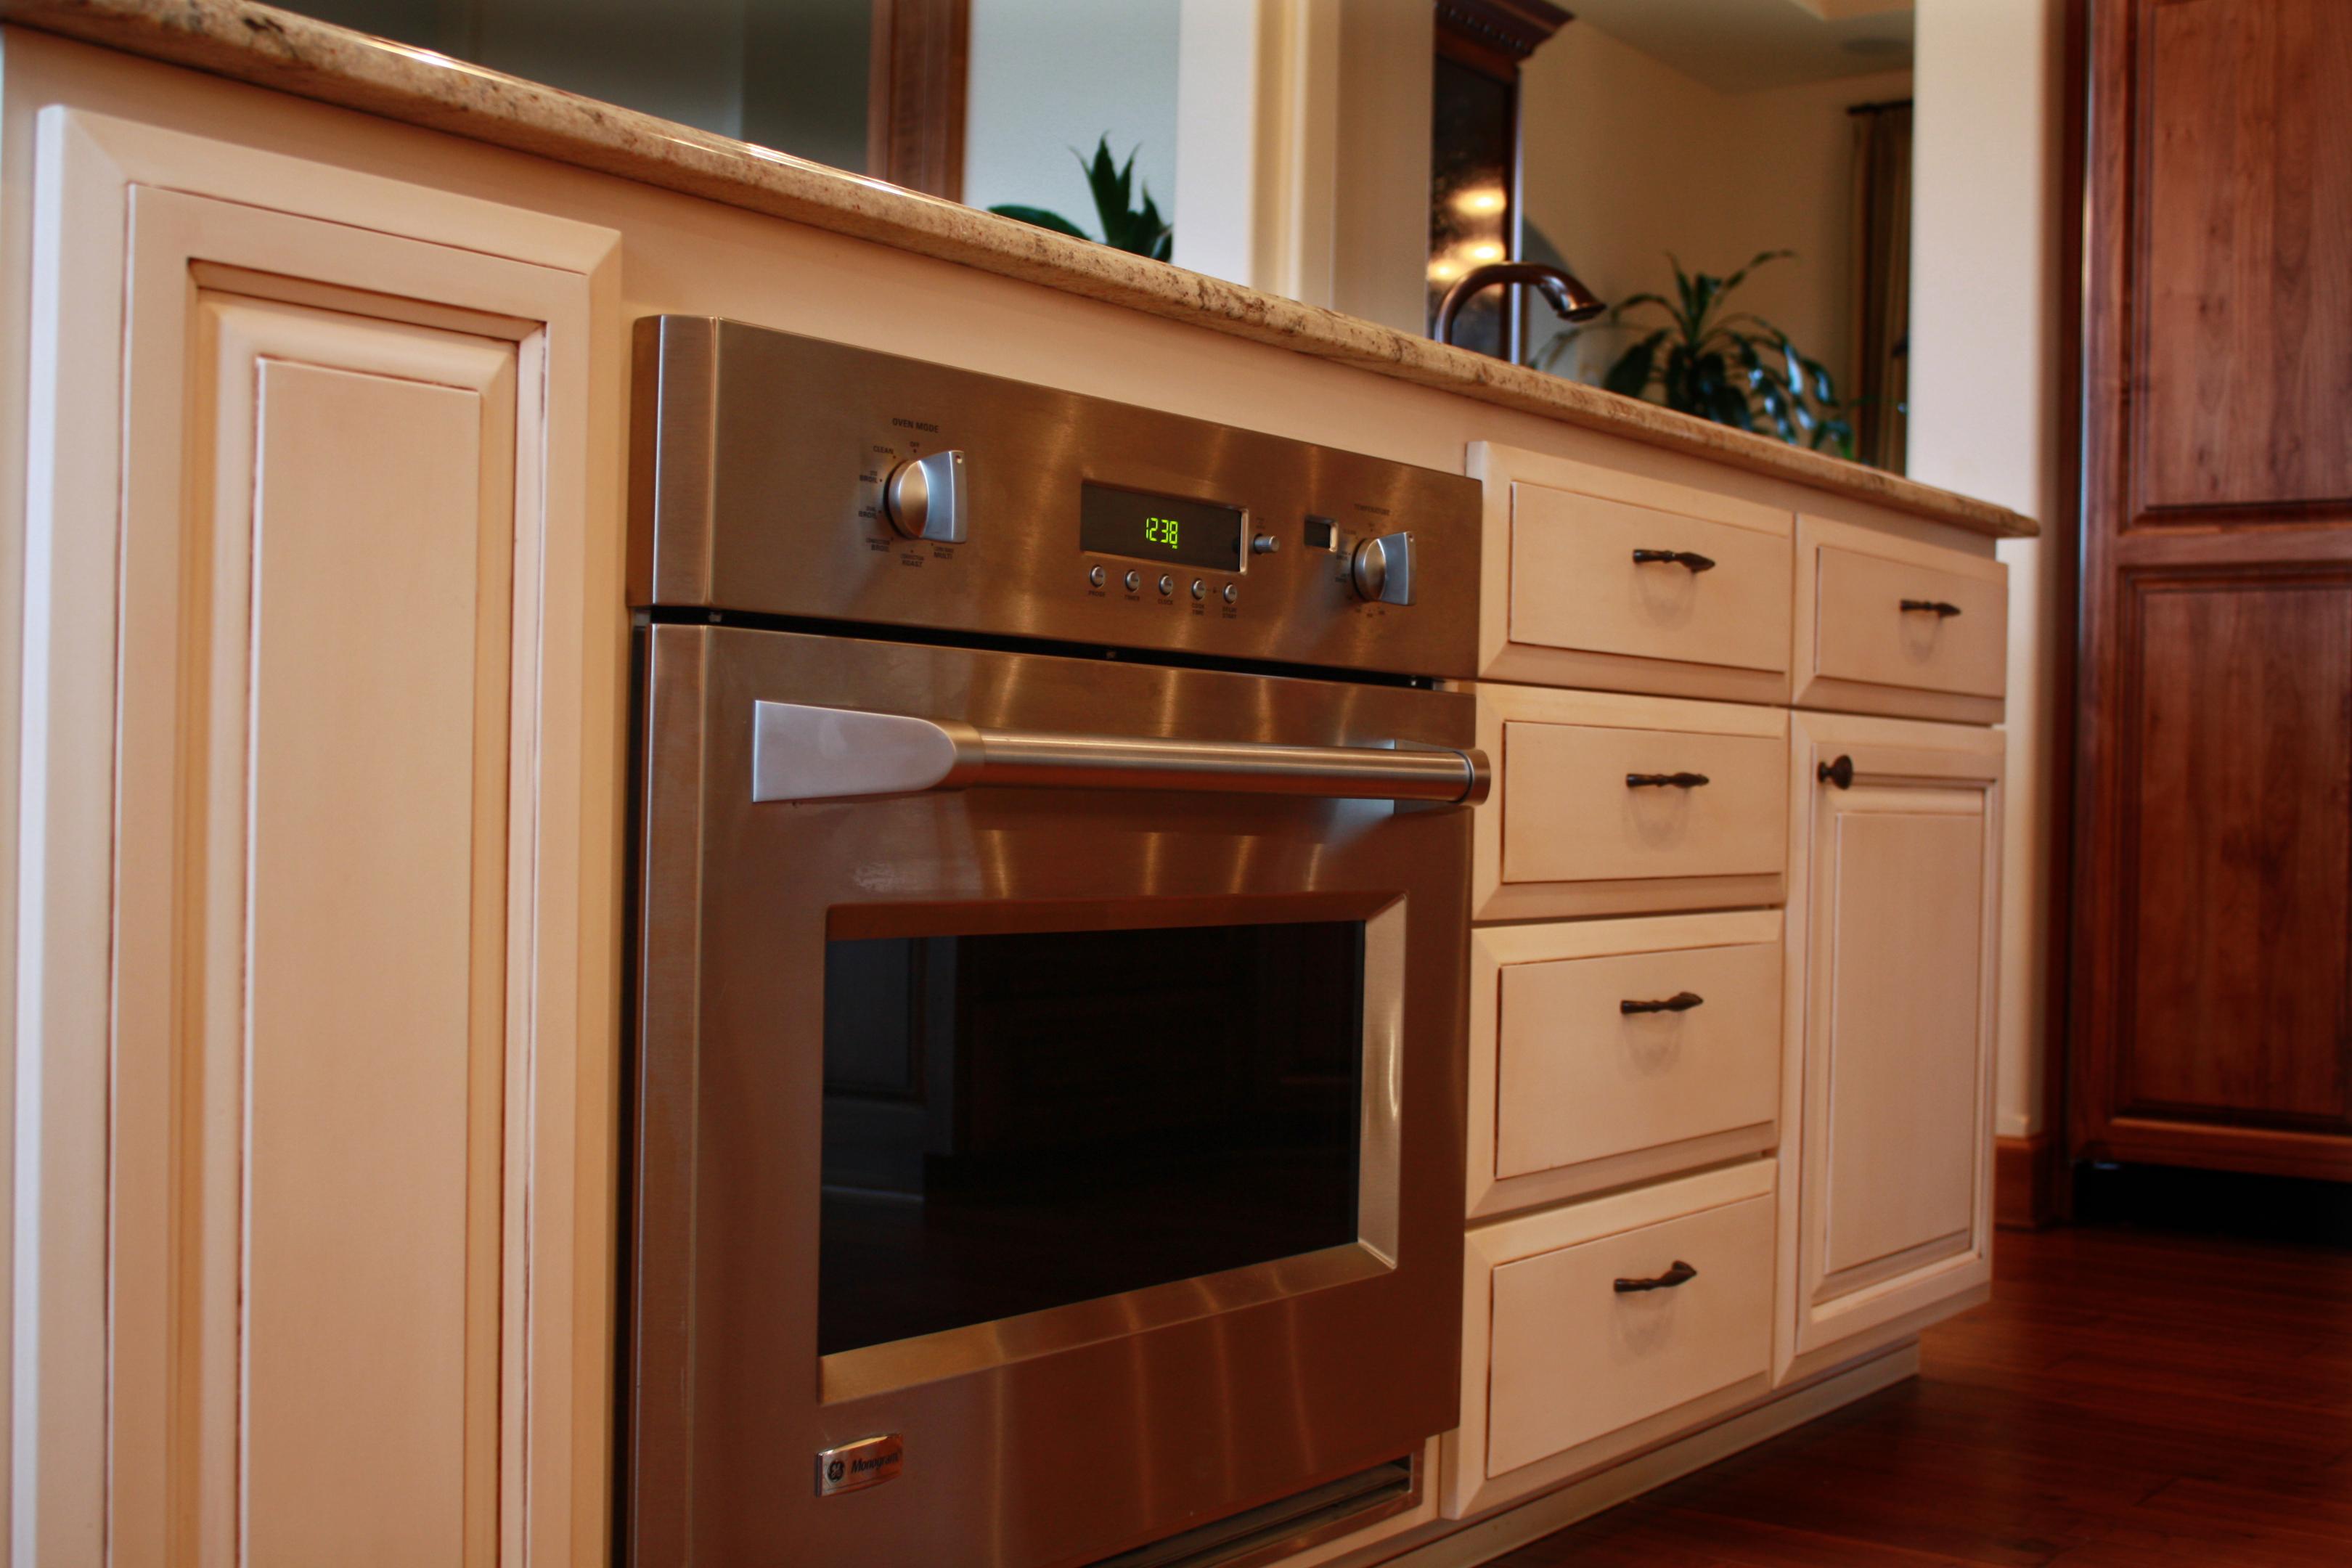 Fullsize Of Western Style Kitchen Cabinets